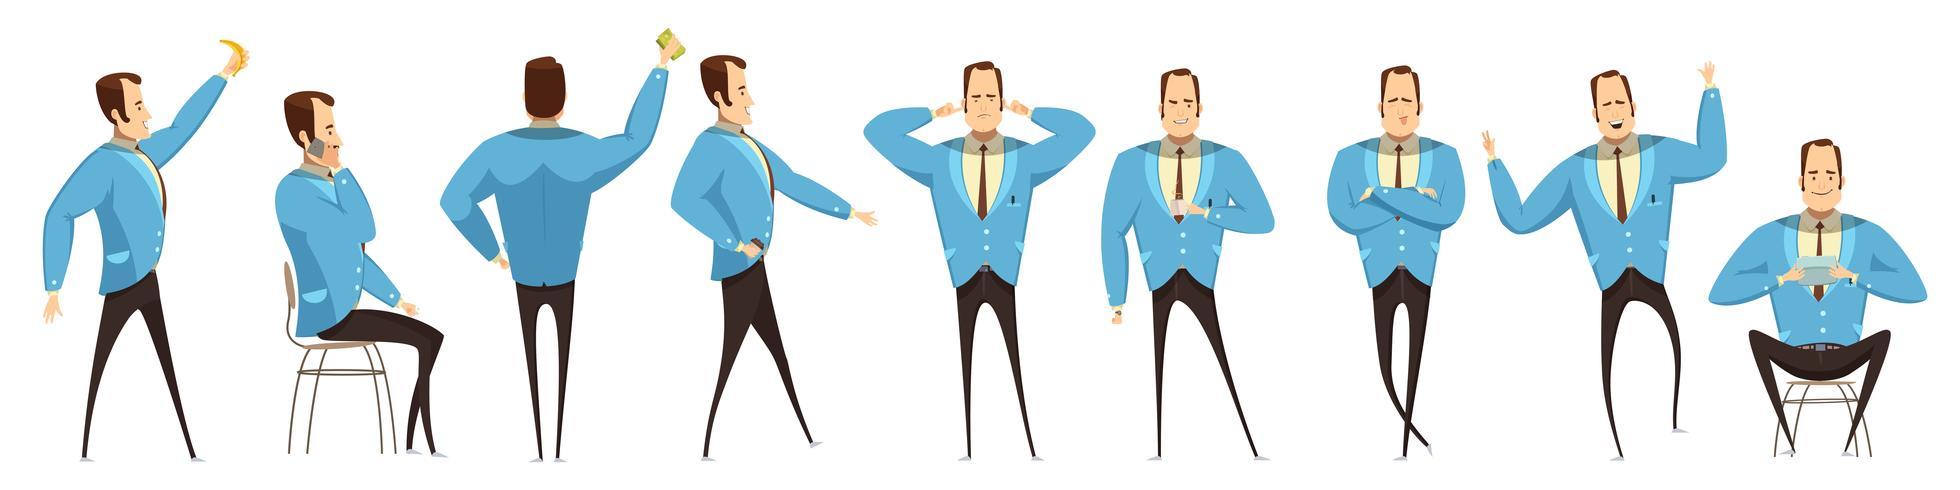 Set di uomo d'affari in varie pose vettore